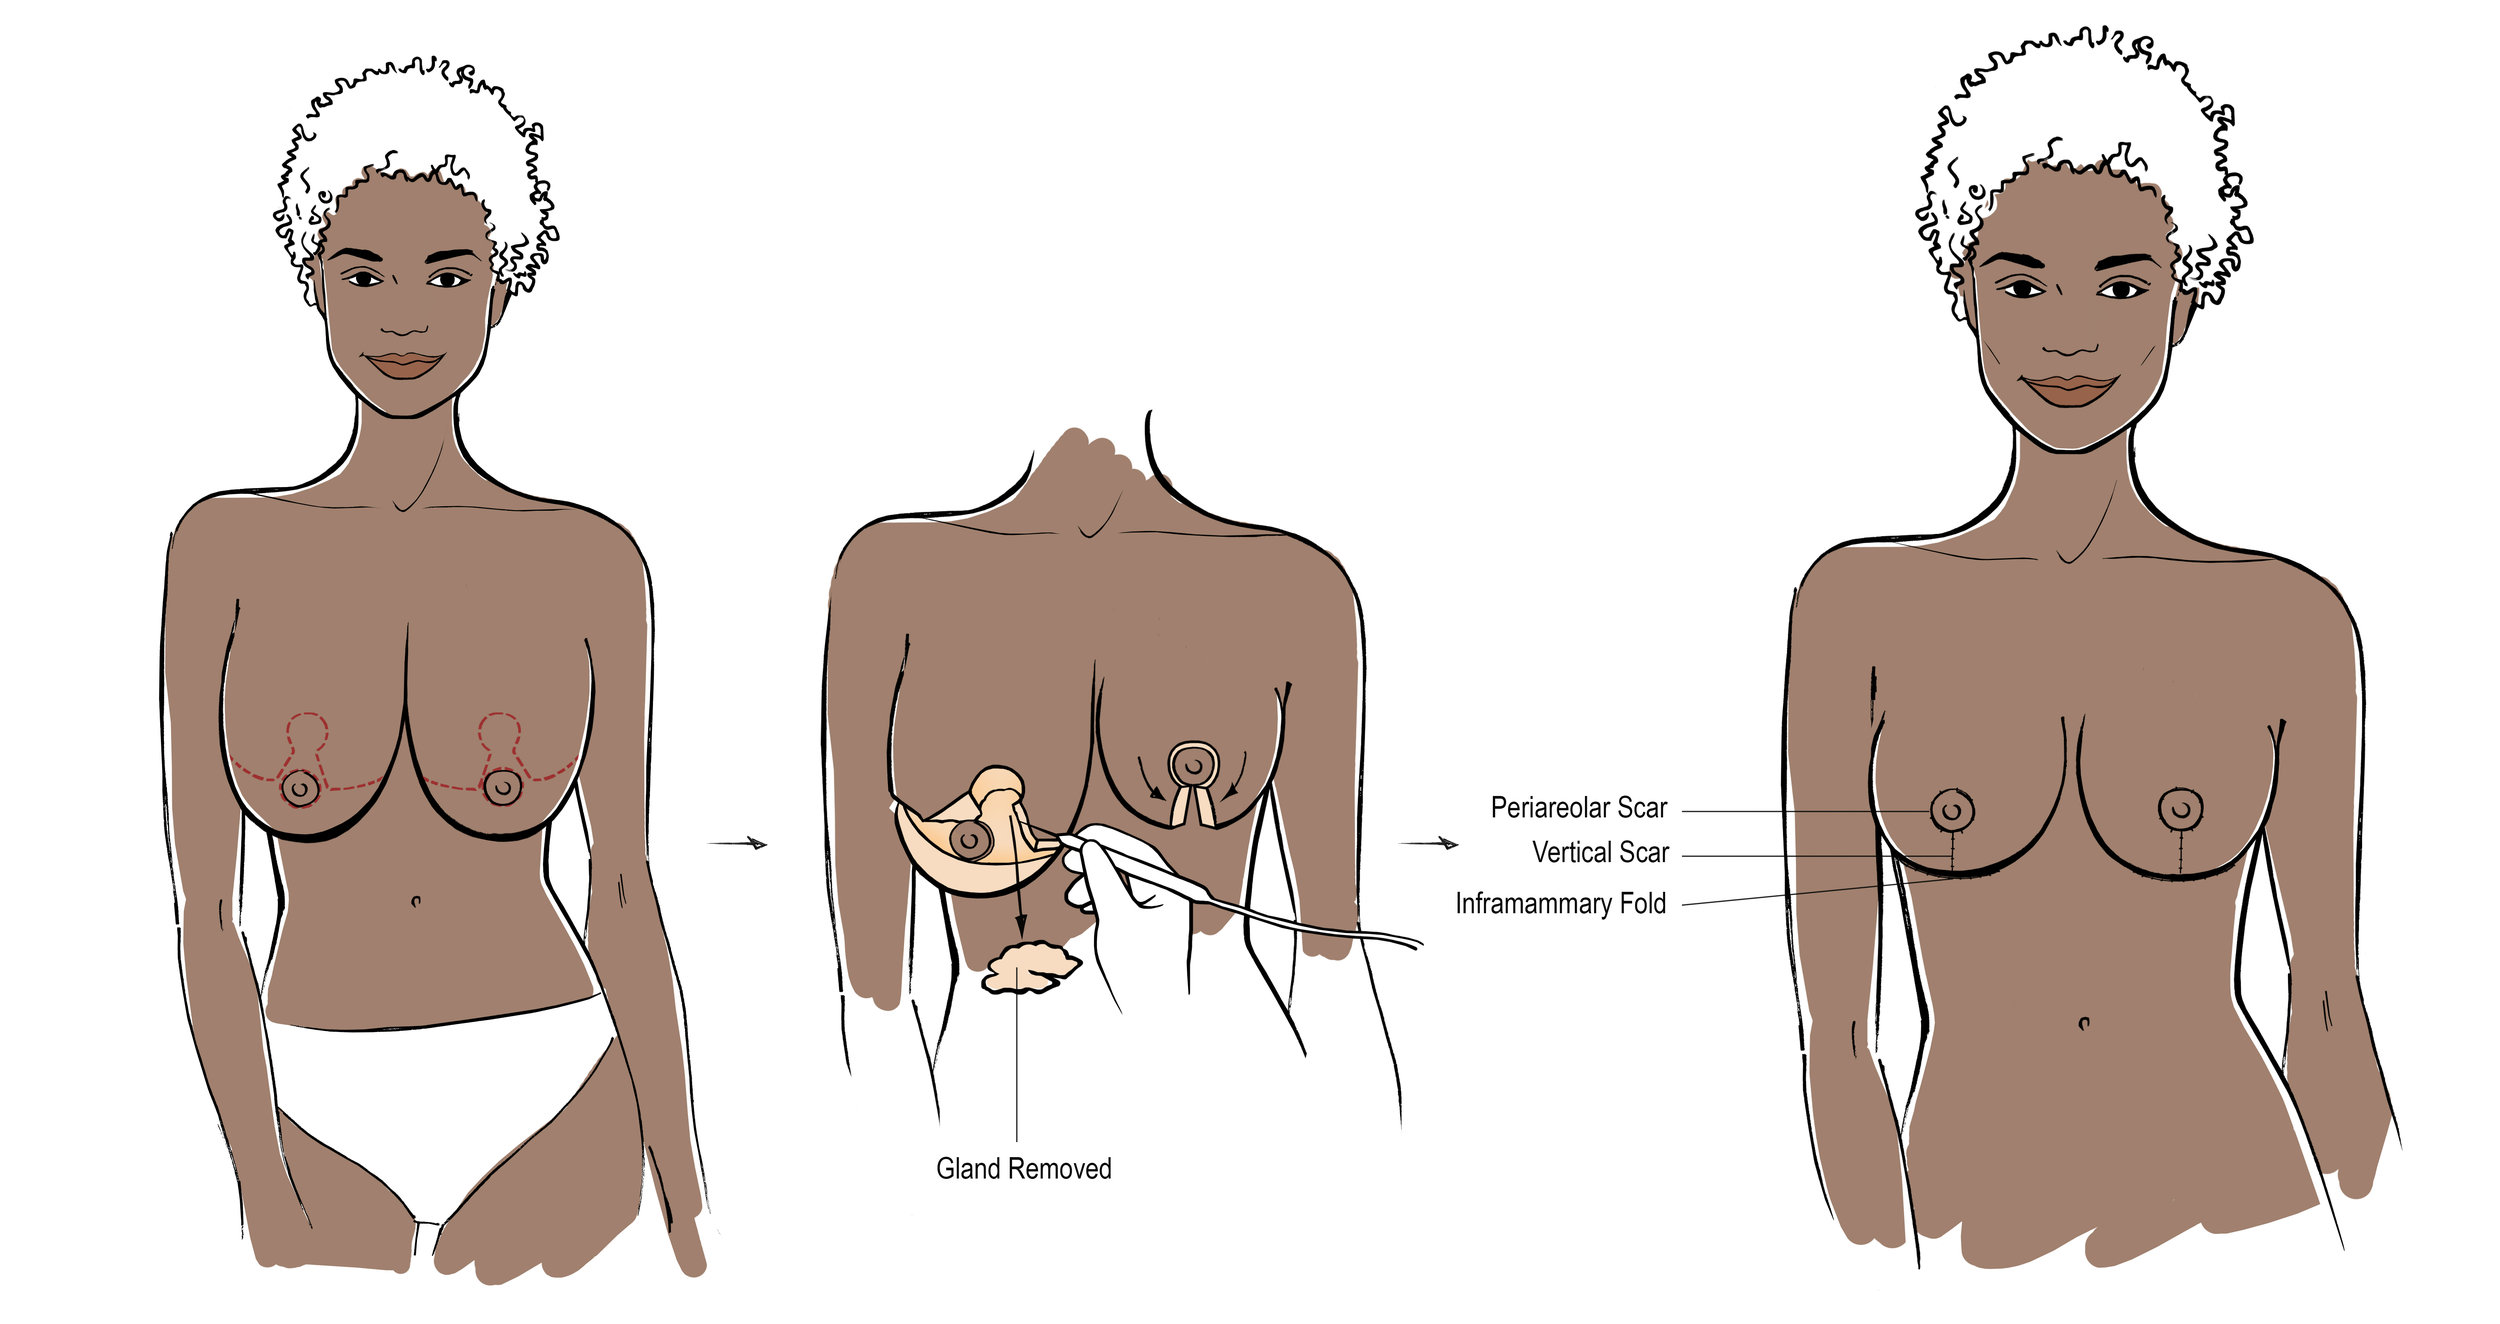 breast reduction, reduction mammaplasty